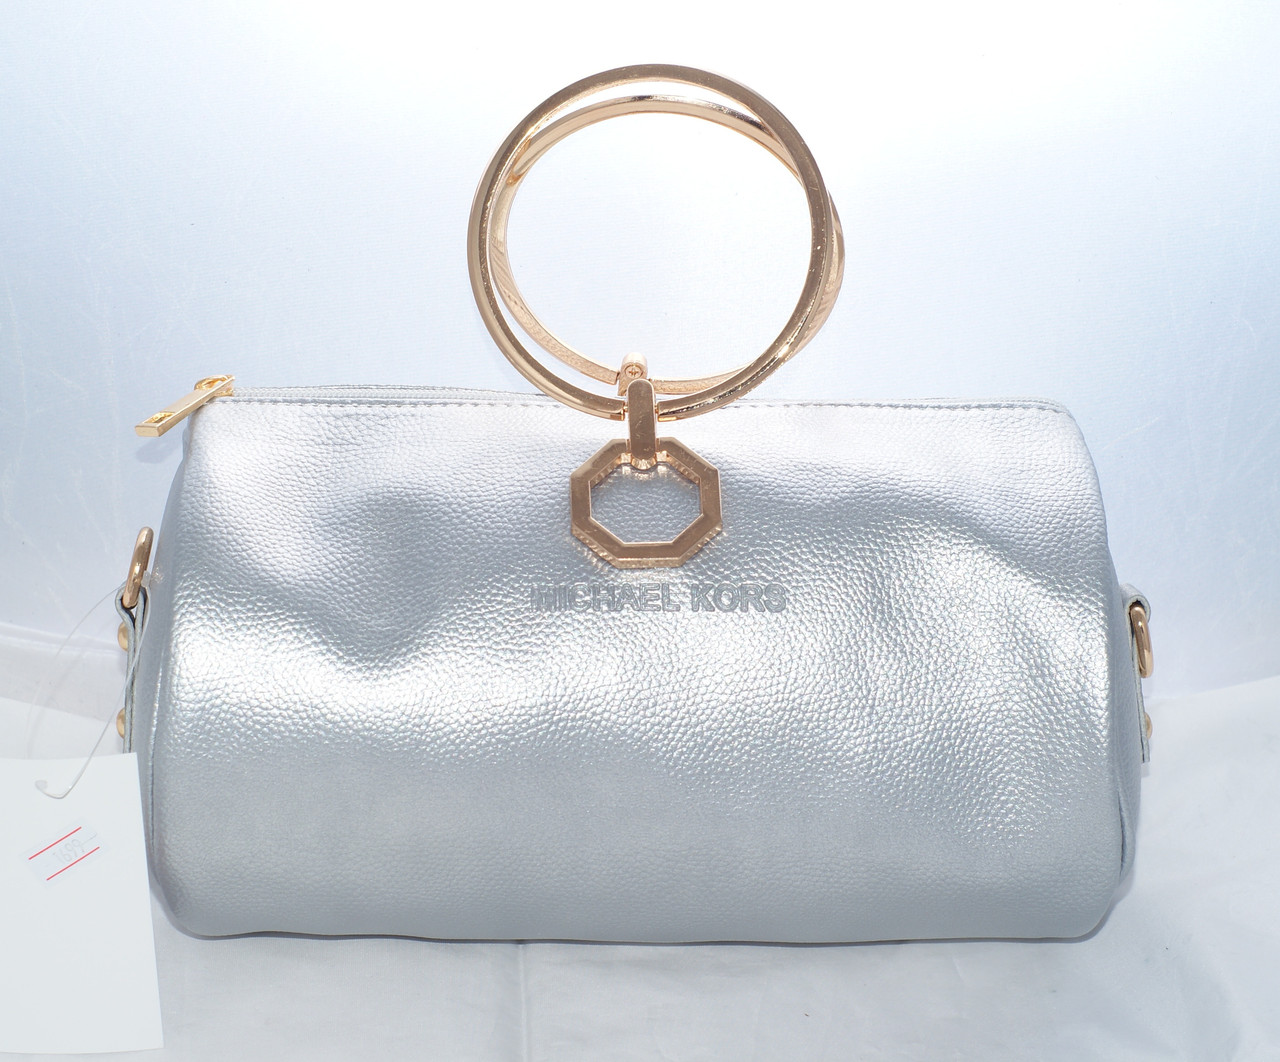 Женская мини сумкаMichael Kors (Майкл Корс), серебристая